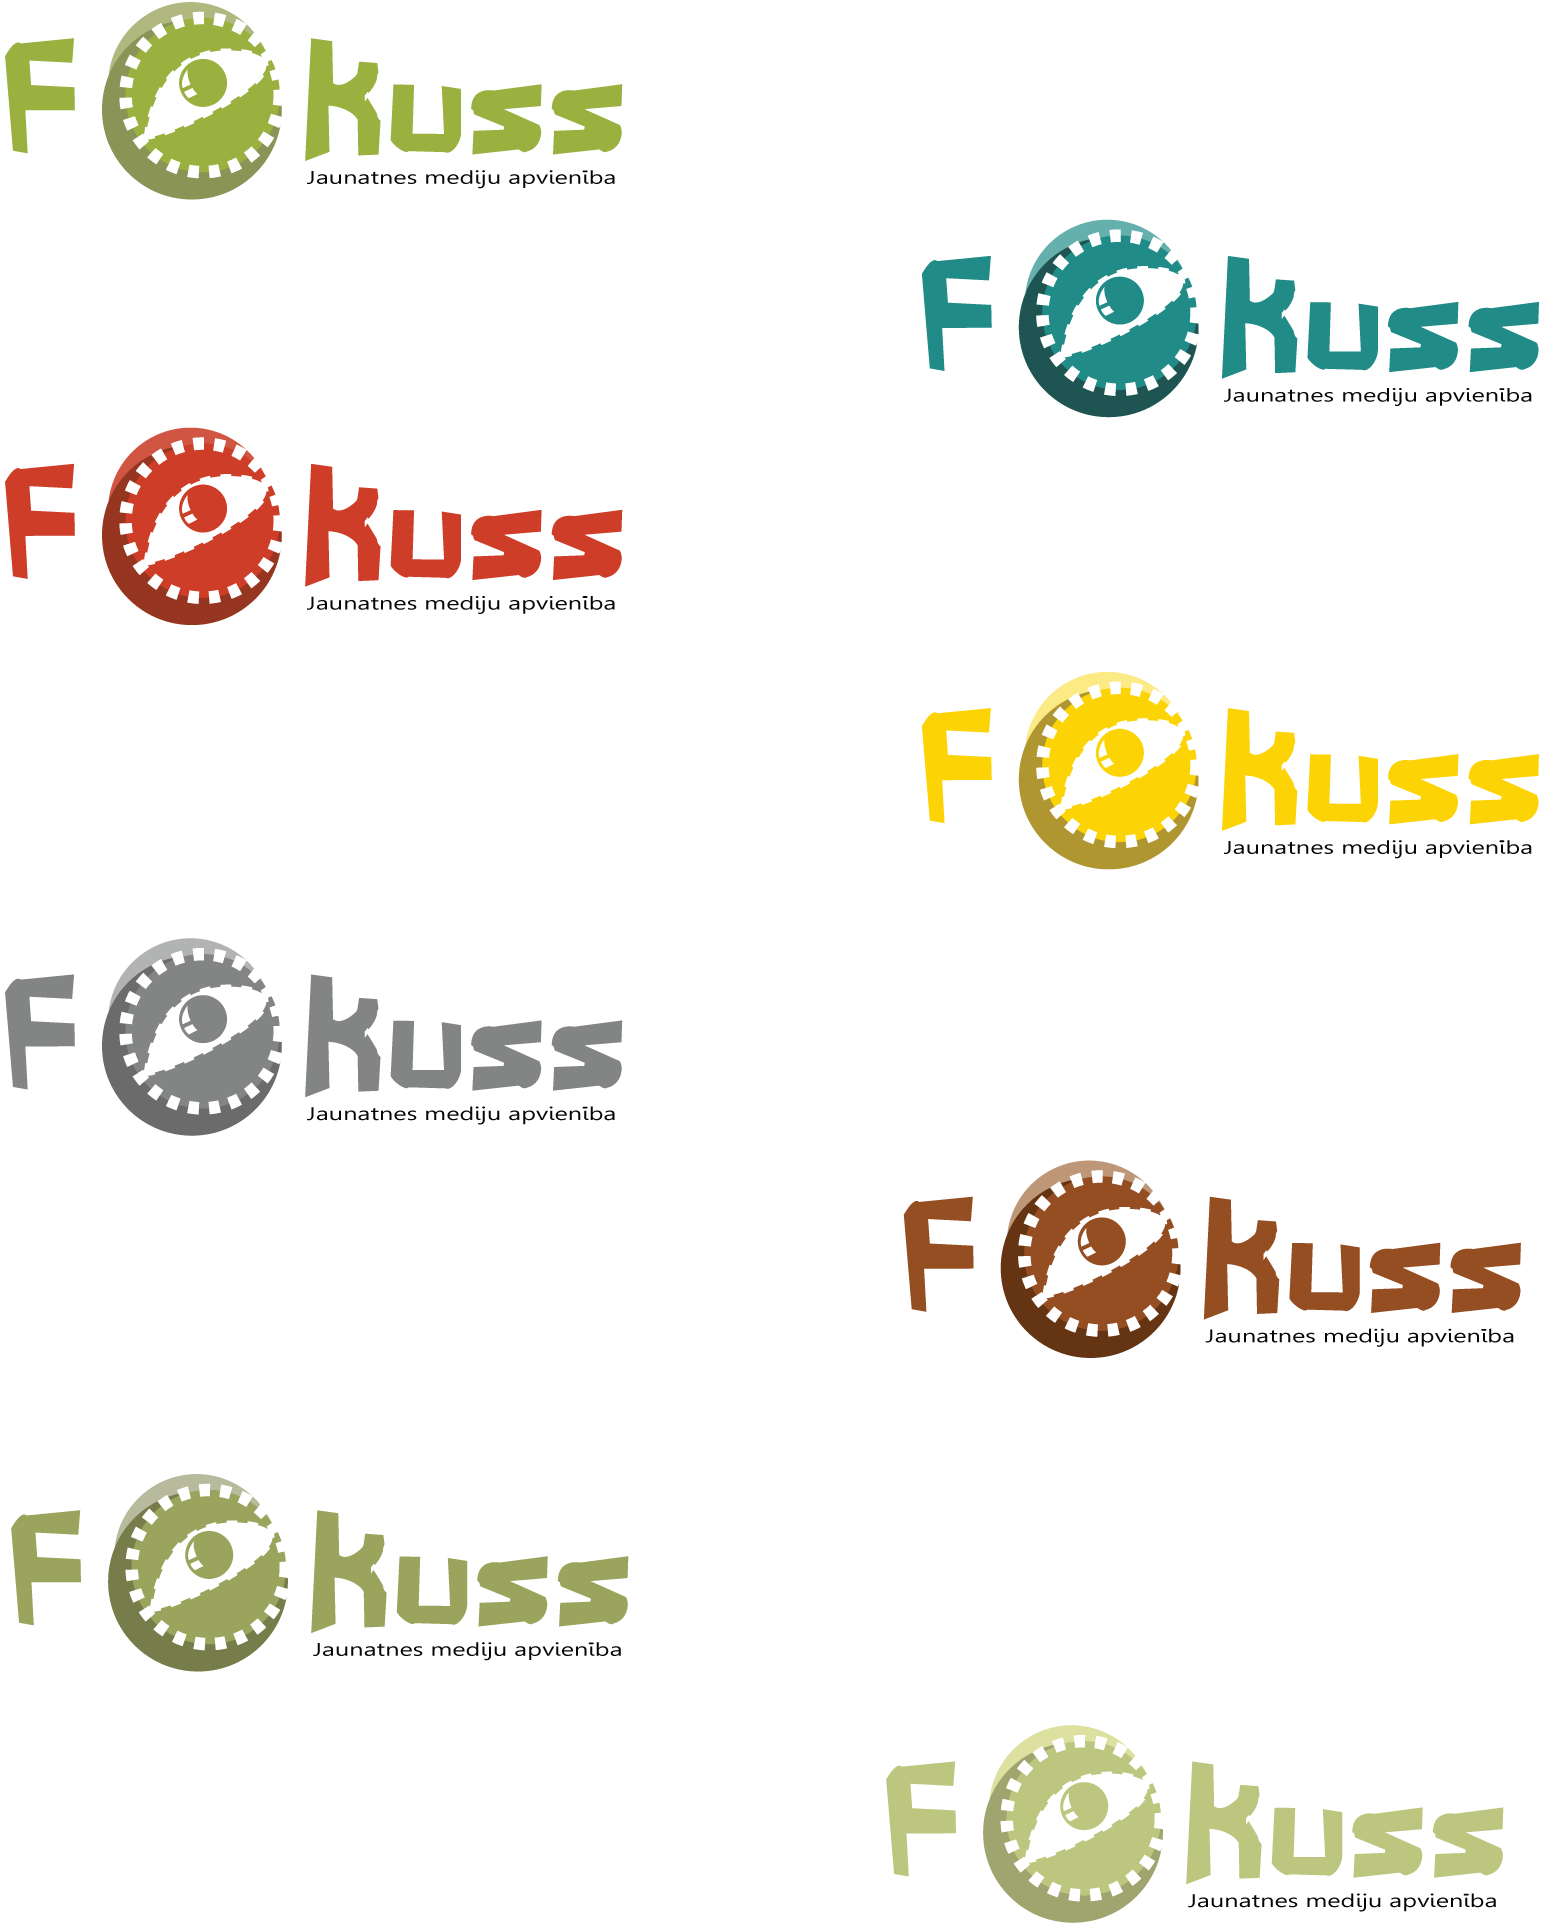 Fokuss logo 2